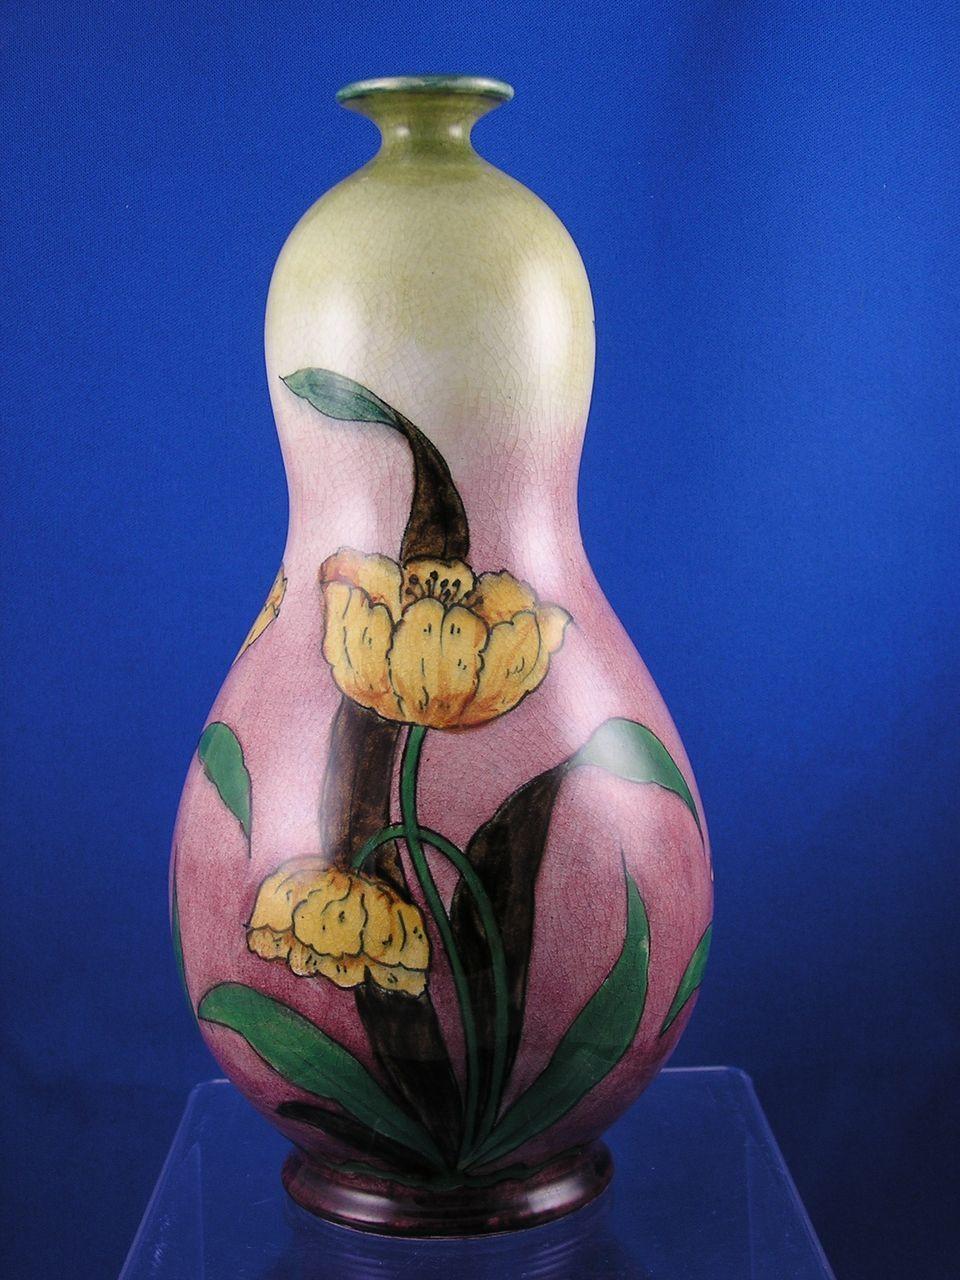 tulip vase antique of royal bonn germany old dutch tulip motif vase c 1890 1923 dutch pertaining to royal bonn germany old dutch tulip motif vase c 1890 1923